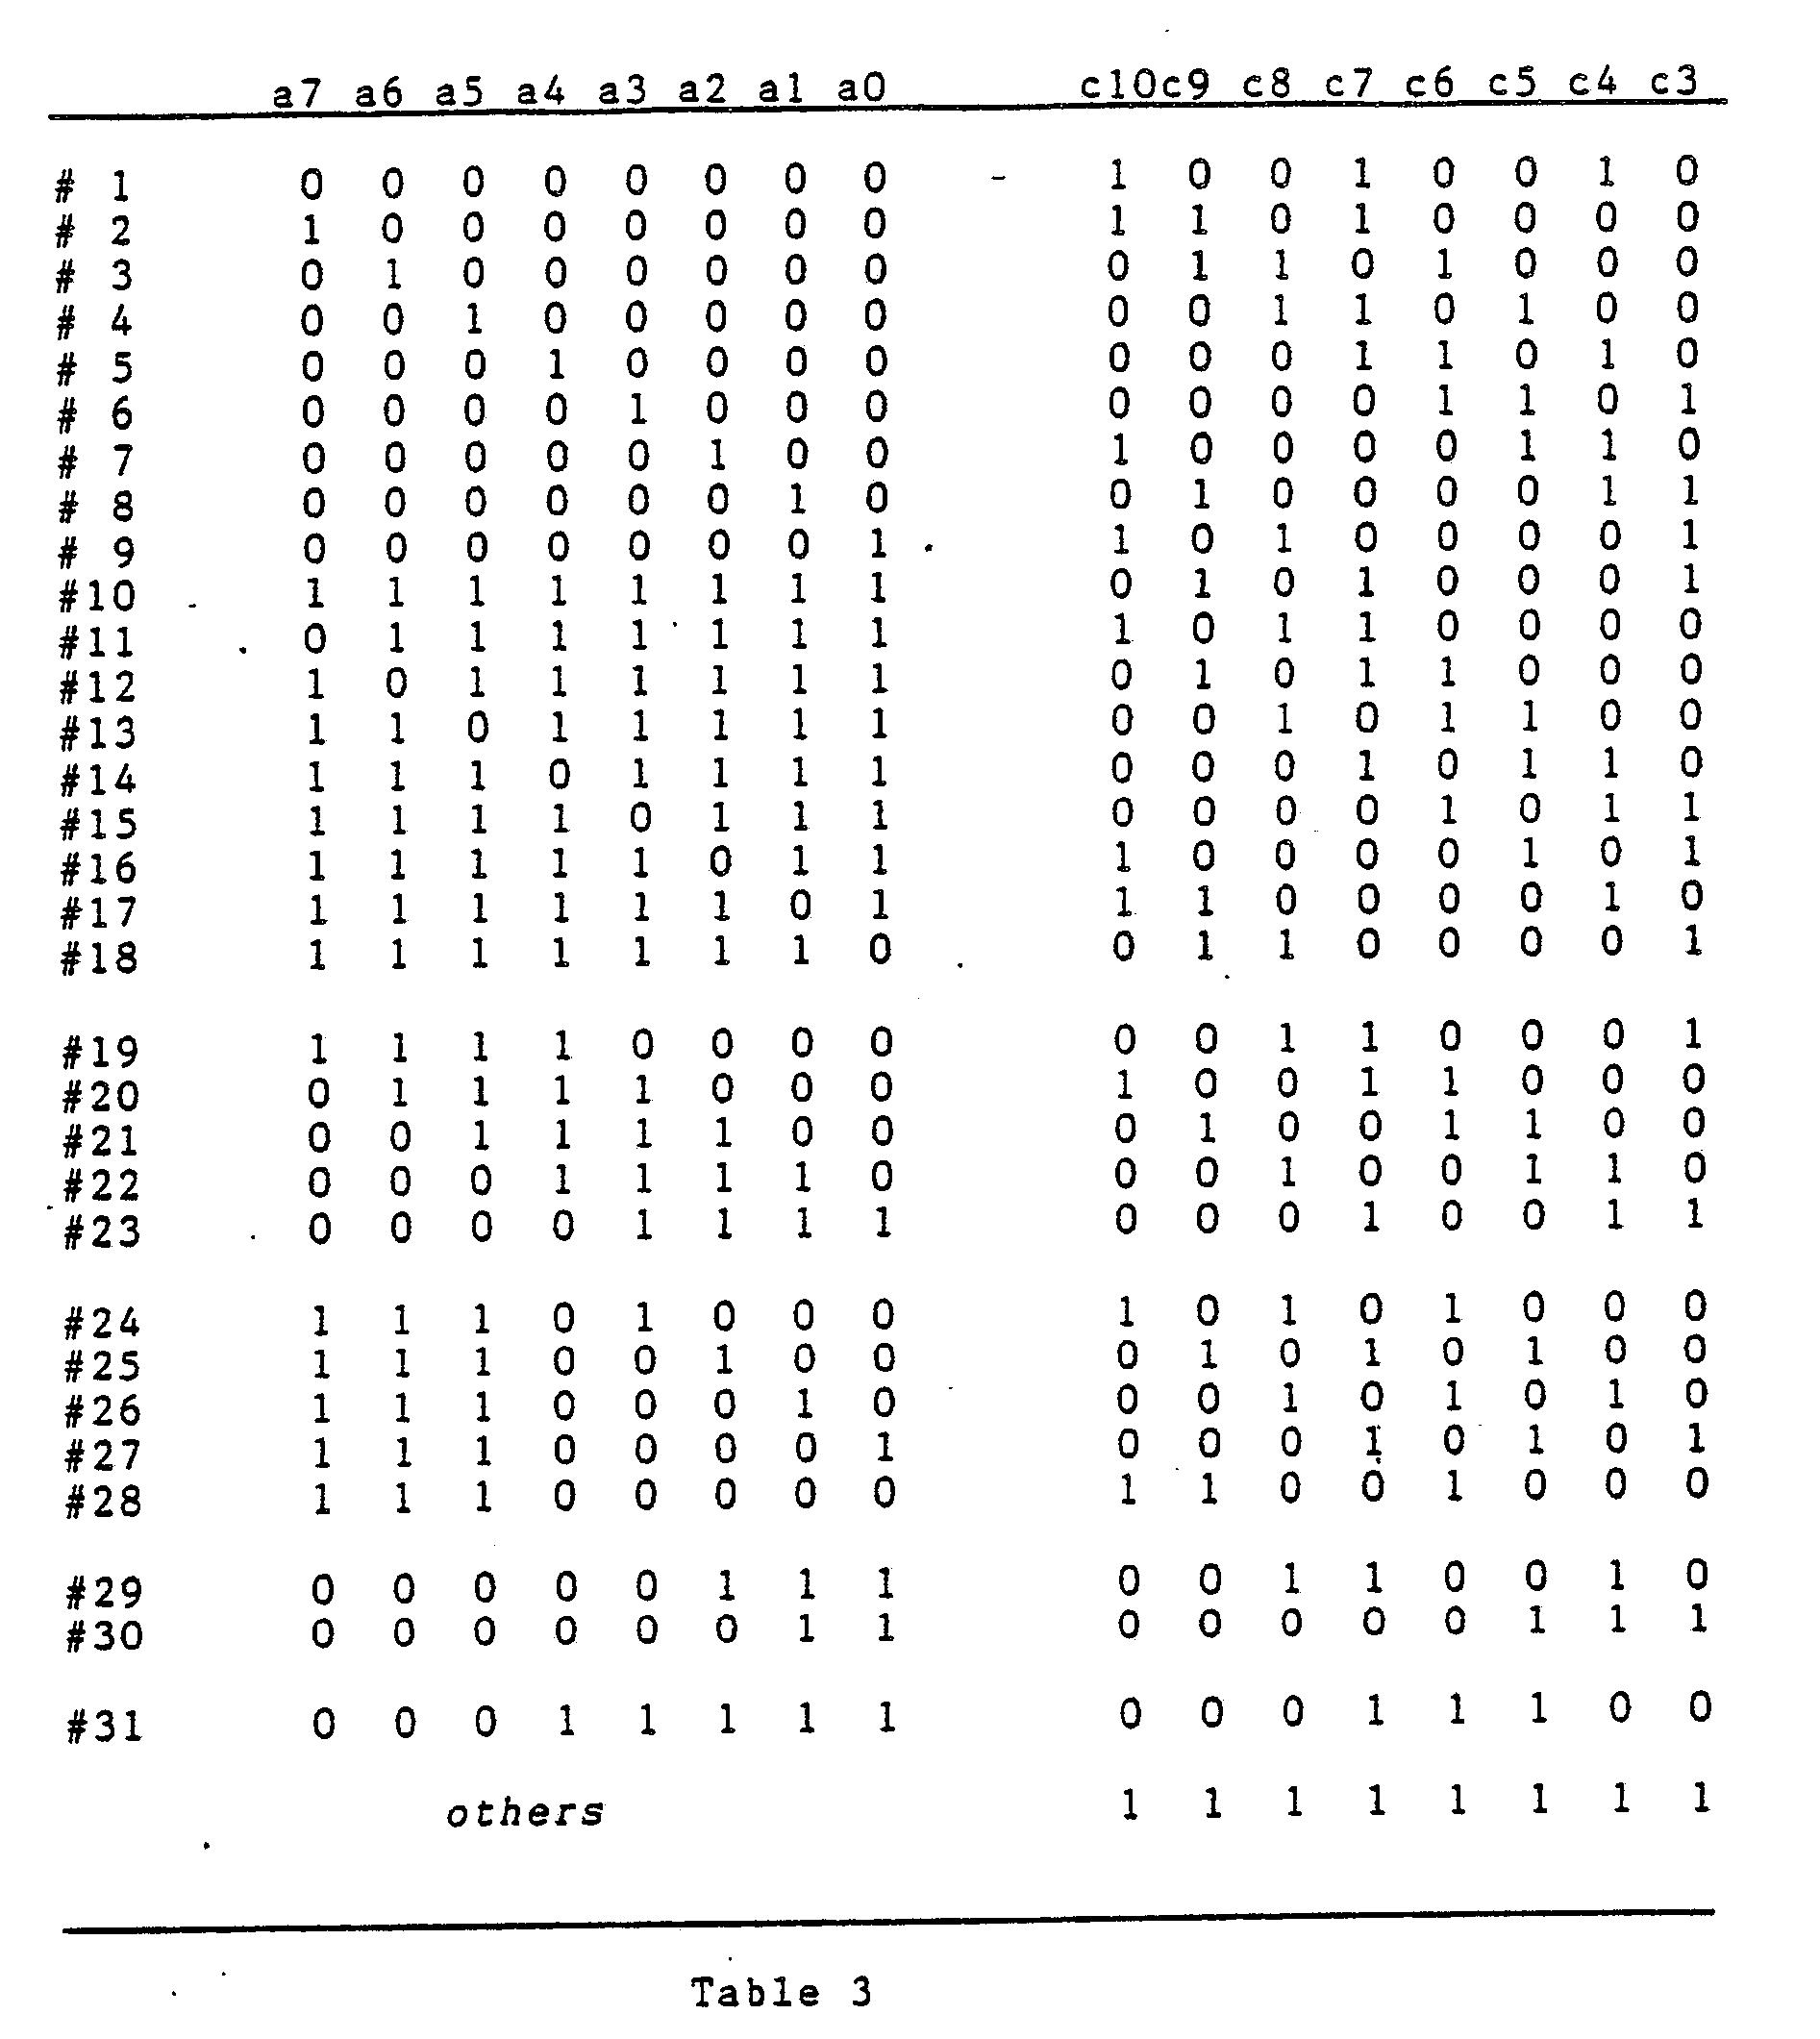 Explain Binary Option Decoded Decoder 4 Input Circuit 8 Bit To Decimal Converter 2 Decode Lcm For Mediatek Android Development Best Broker Australia Bin Re Optionen Wann Traden